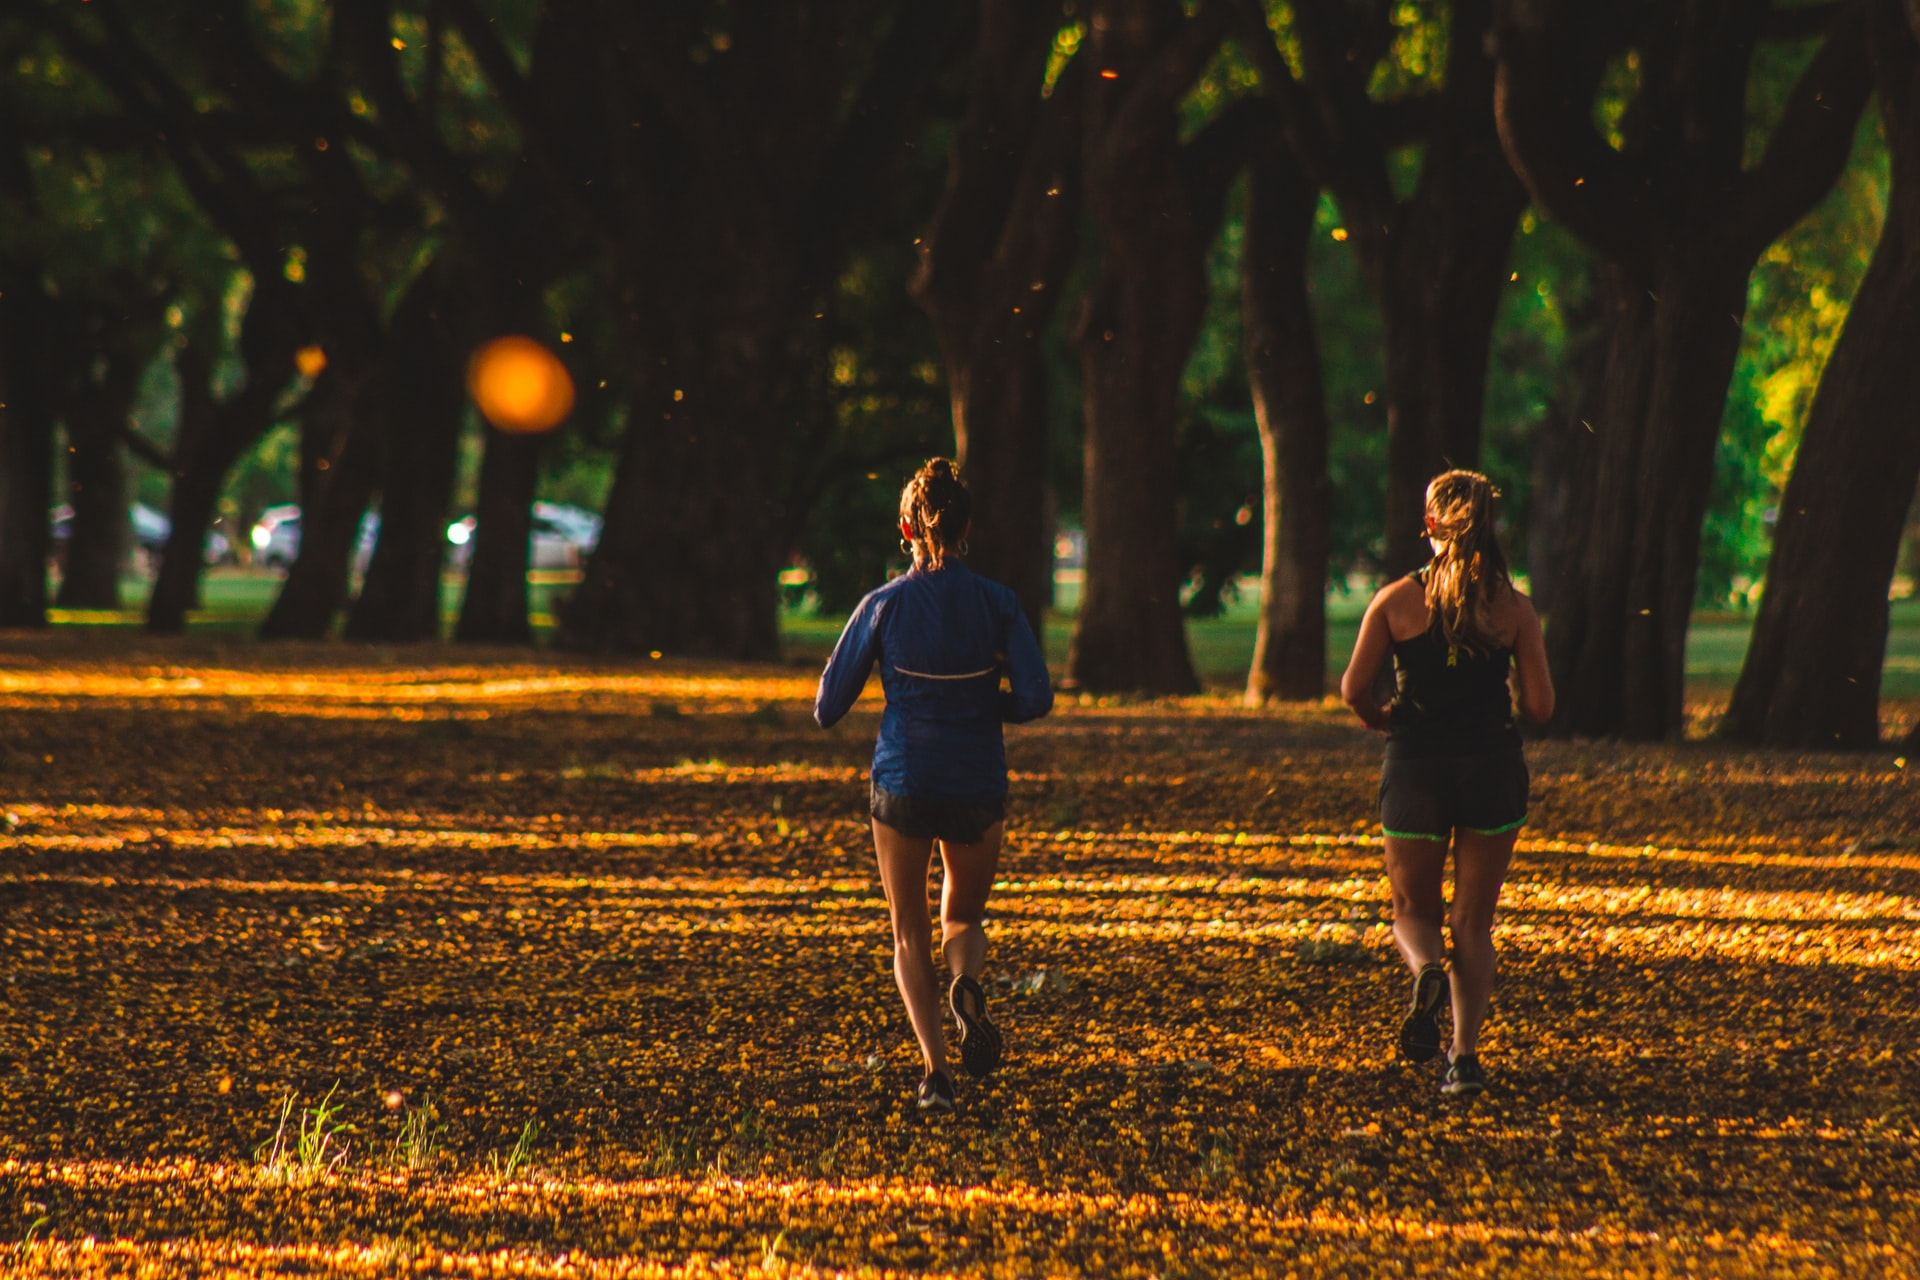 women-running-in-park